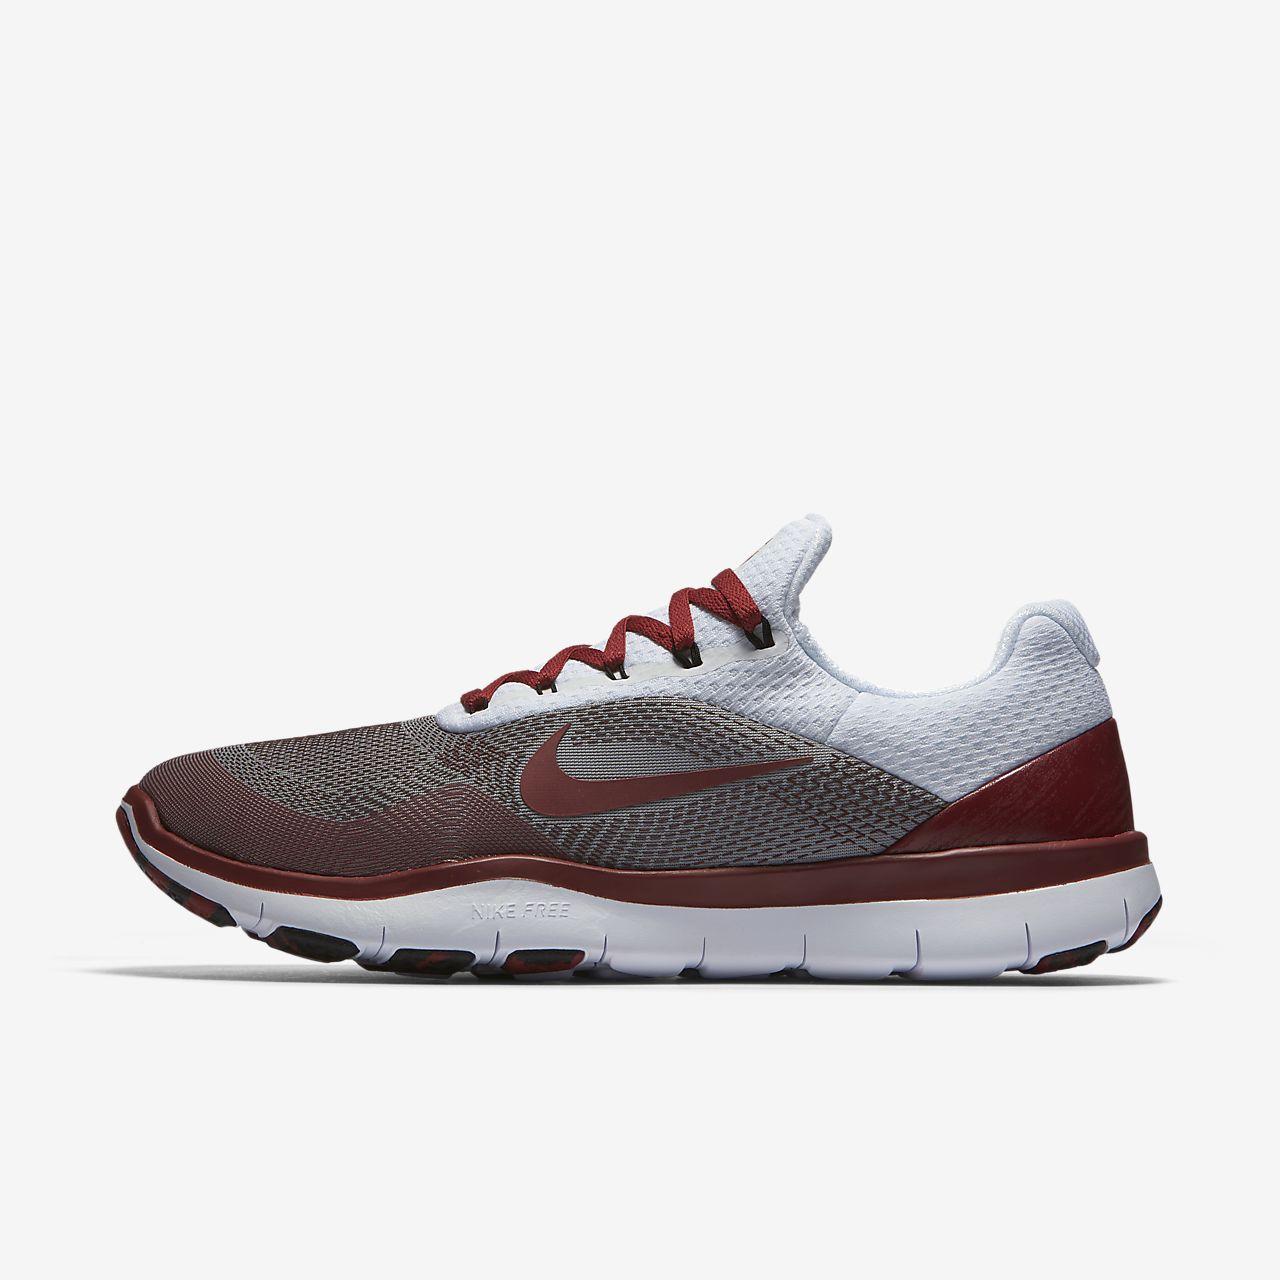 08e41f1c104a Nike Free Trainer V7 Week Zero (Oklahoma) Training Shoe ...